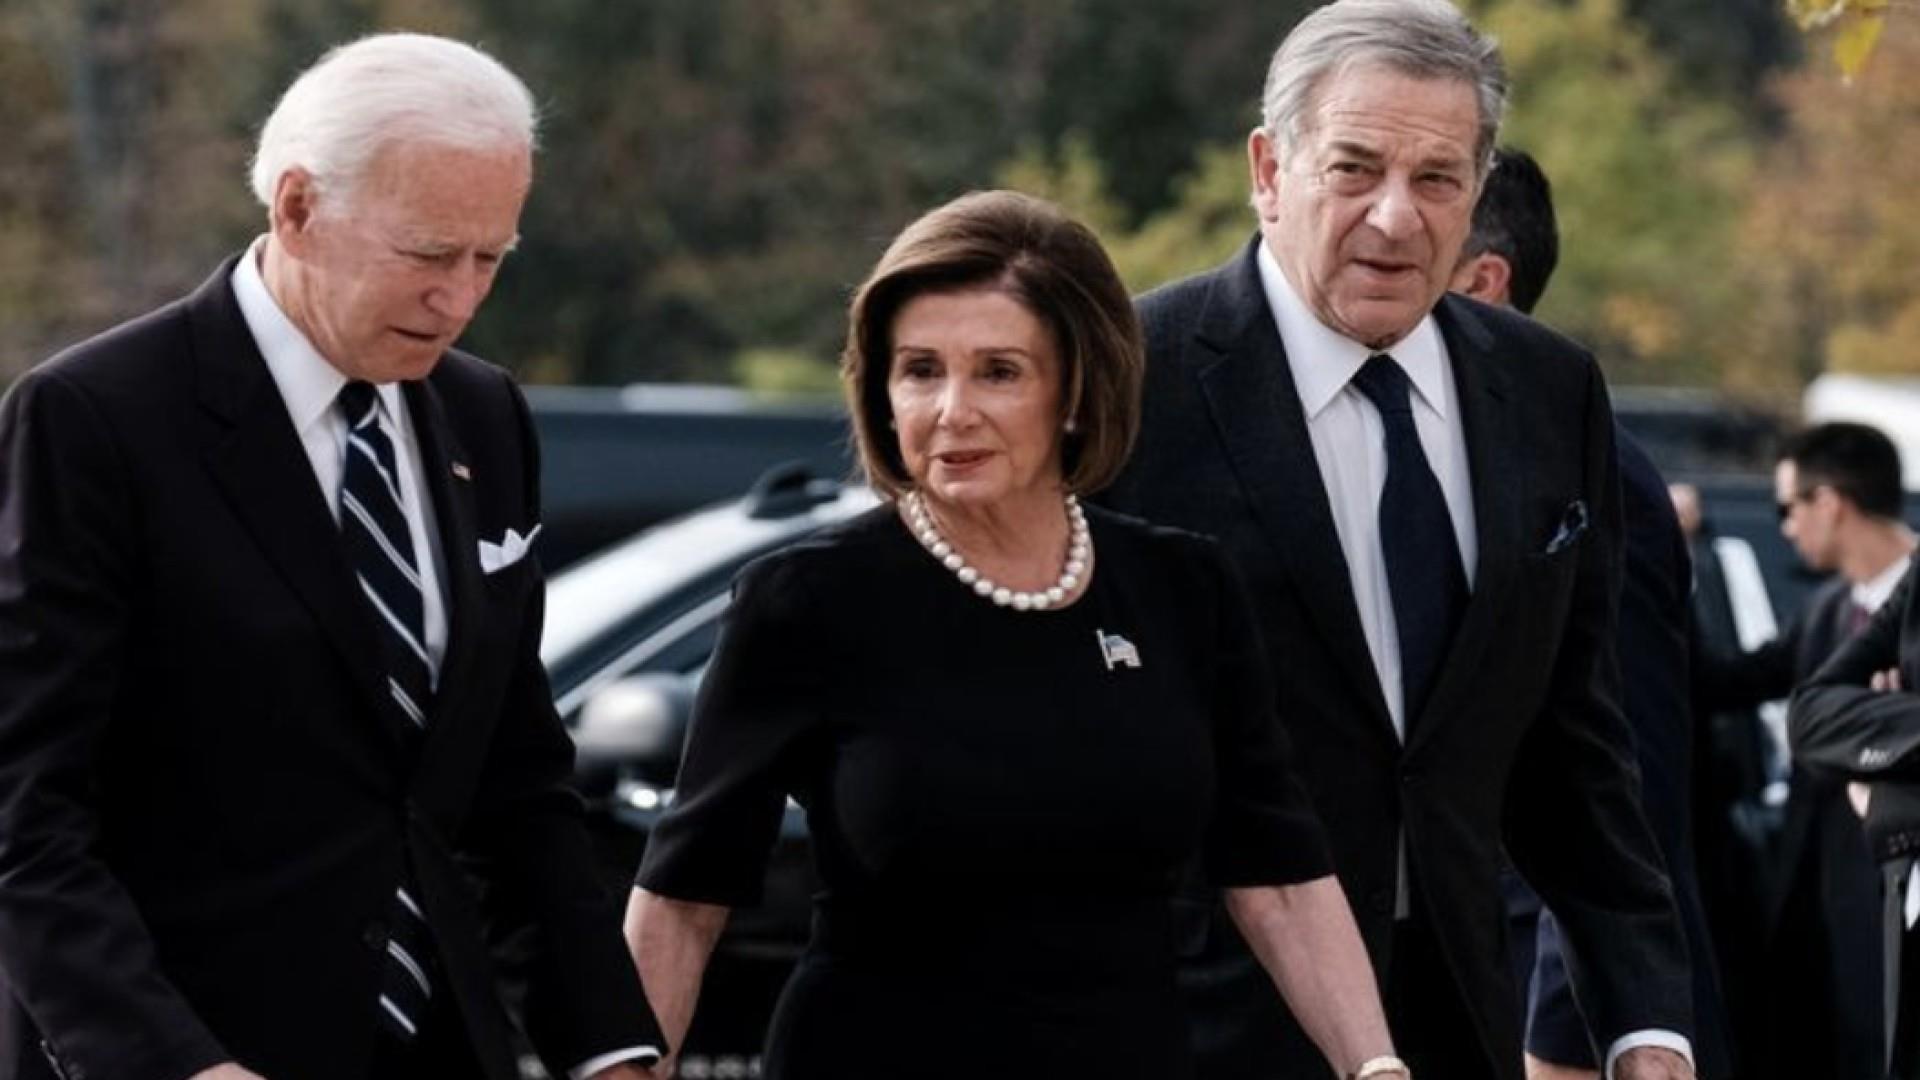 I believe him': Speaker Pelosi stands by Joe Biden